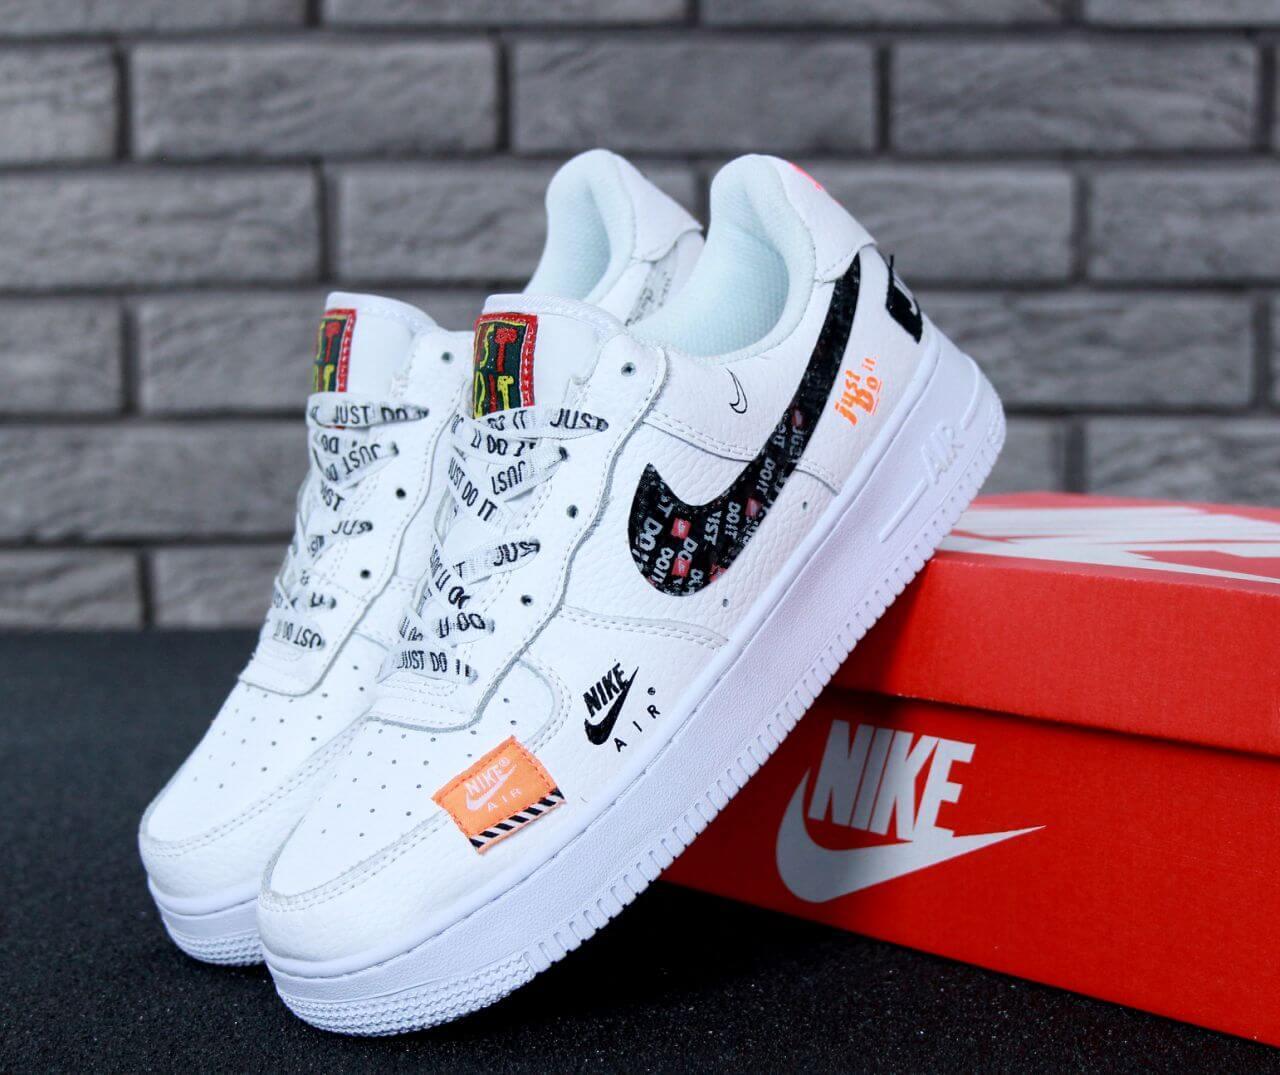 9c776f05 Белые кроссовки Nike Air Force 1 Low Just Do It - Интернет магазин обуви «im